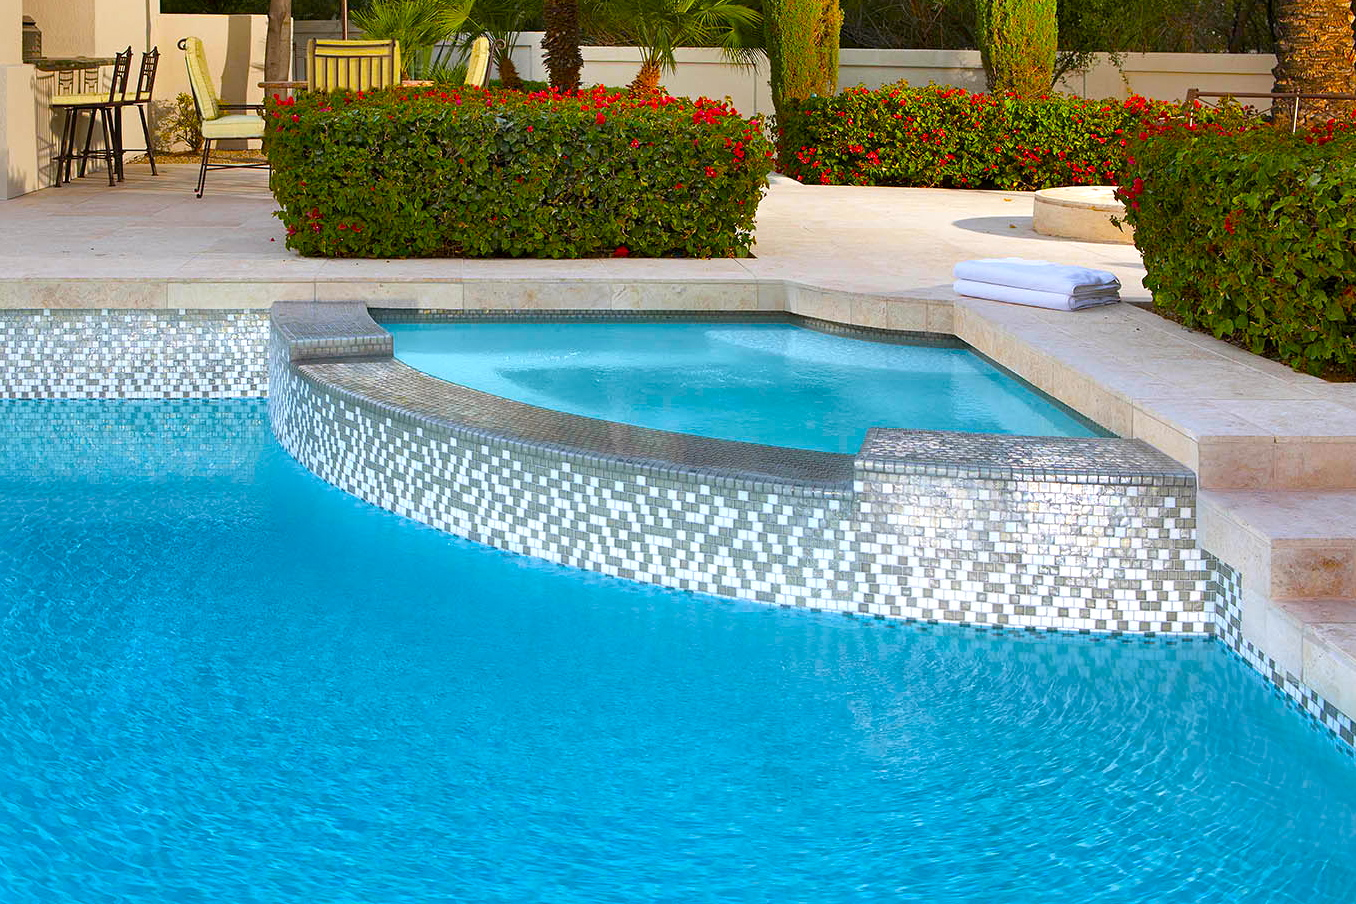 Green Pool Cleaning – Chlorine Wash